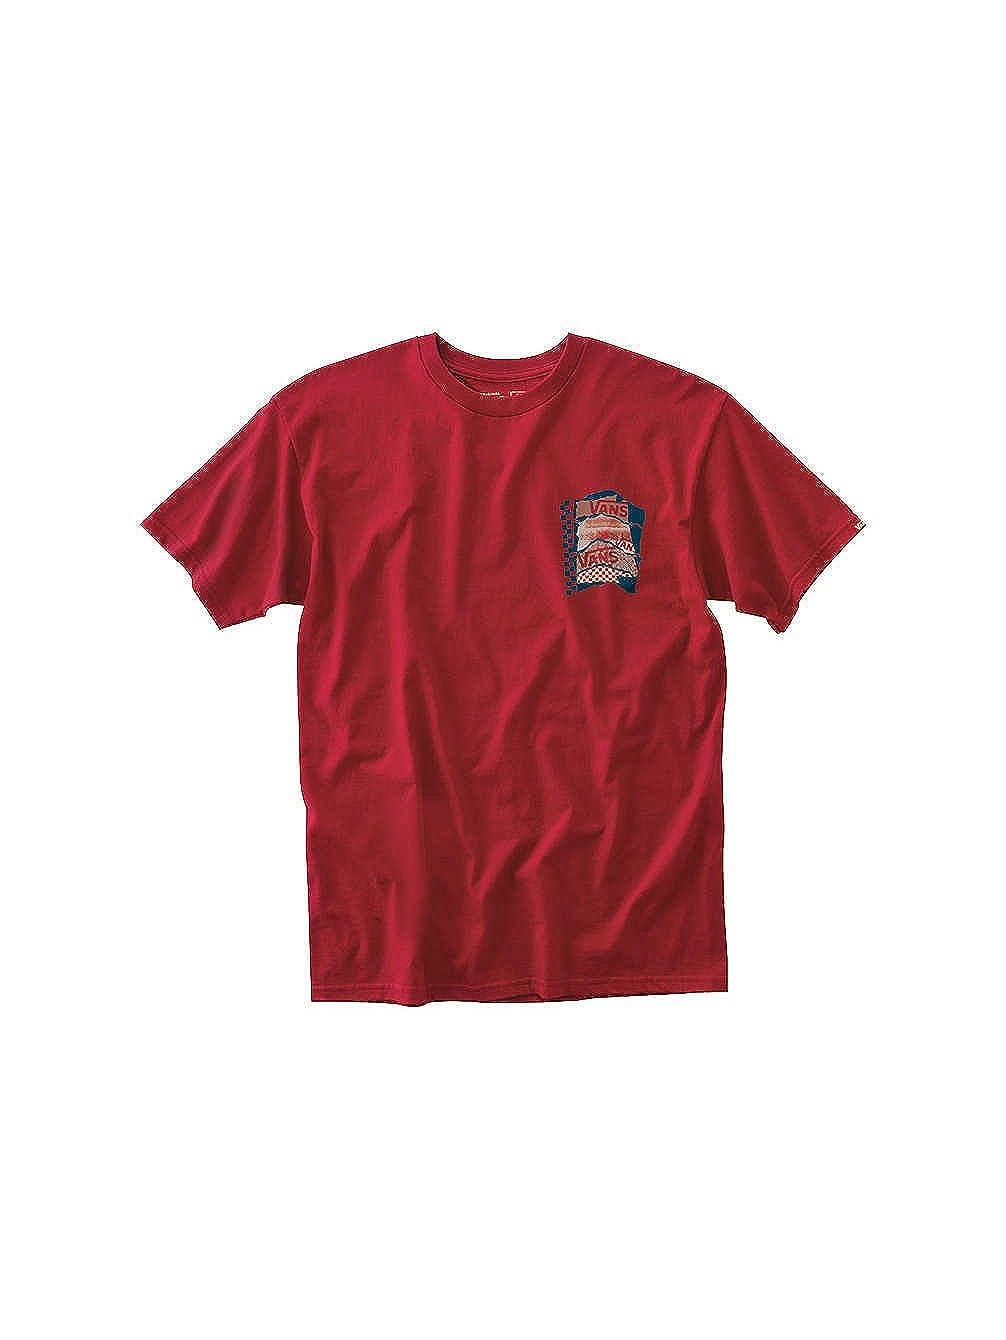 c36c9da62 Top4: Vans Men's Av Checkerpast Graphic T-Shirt